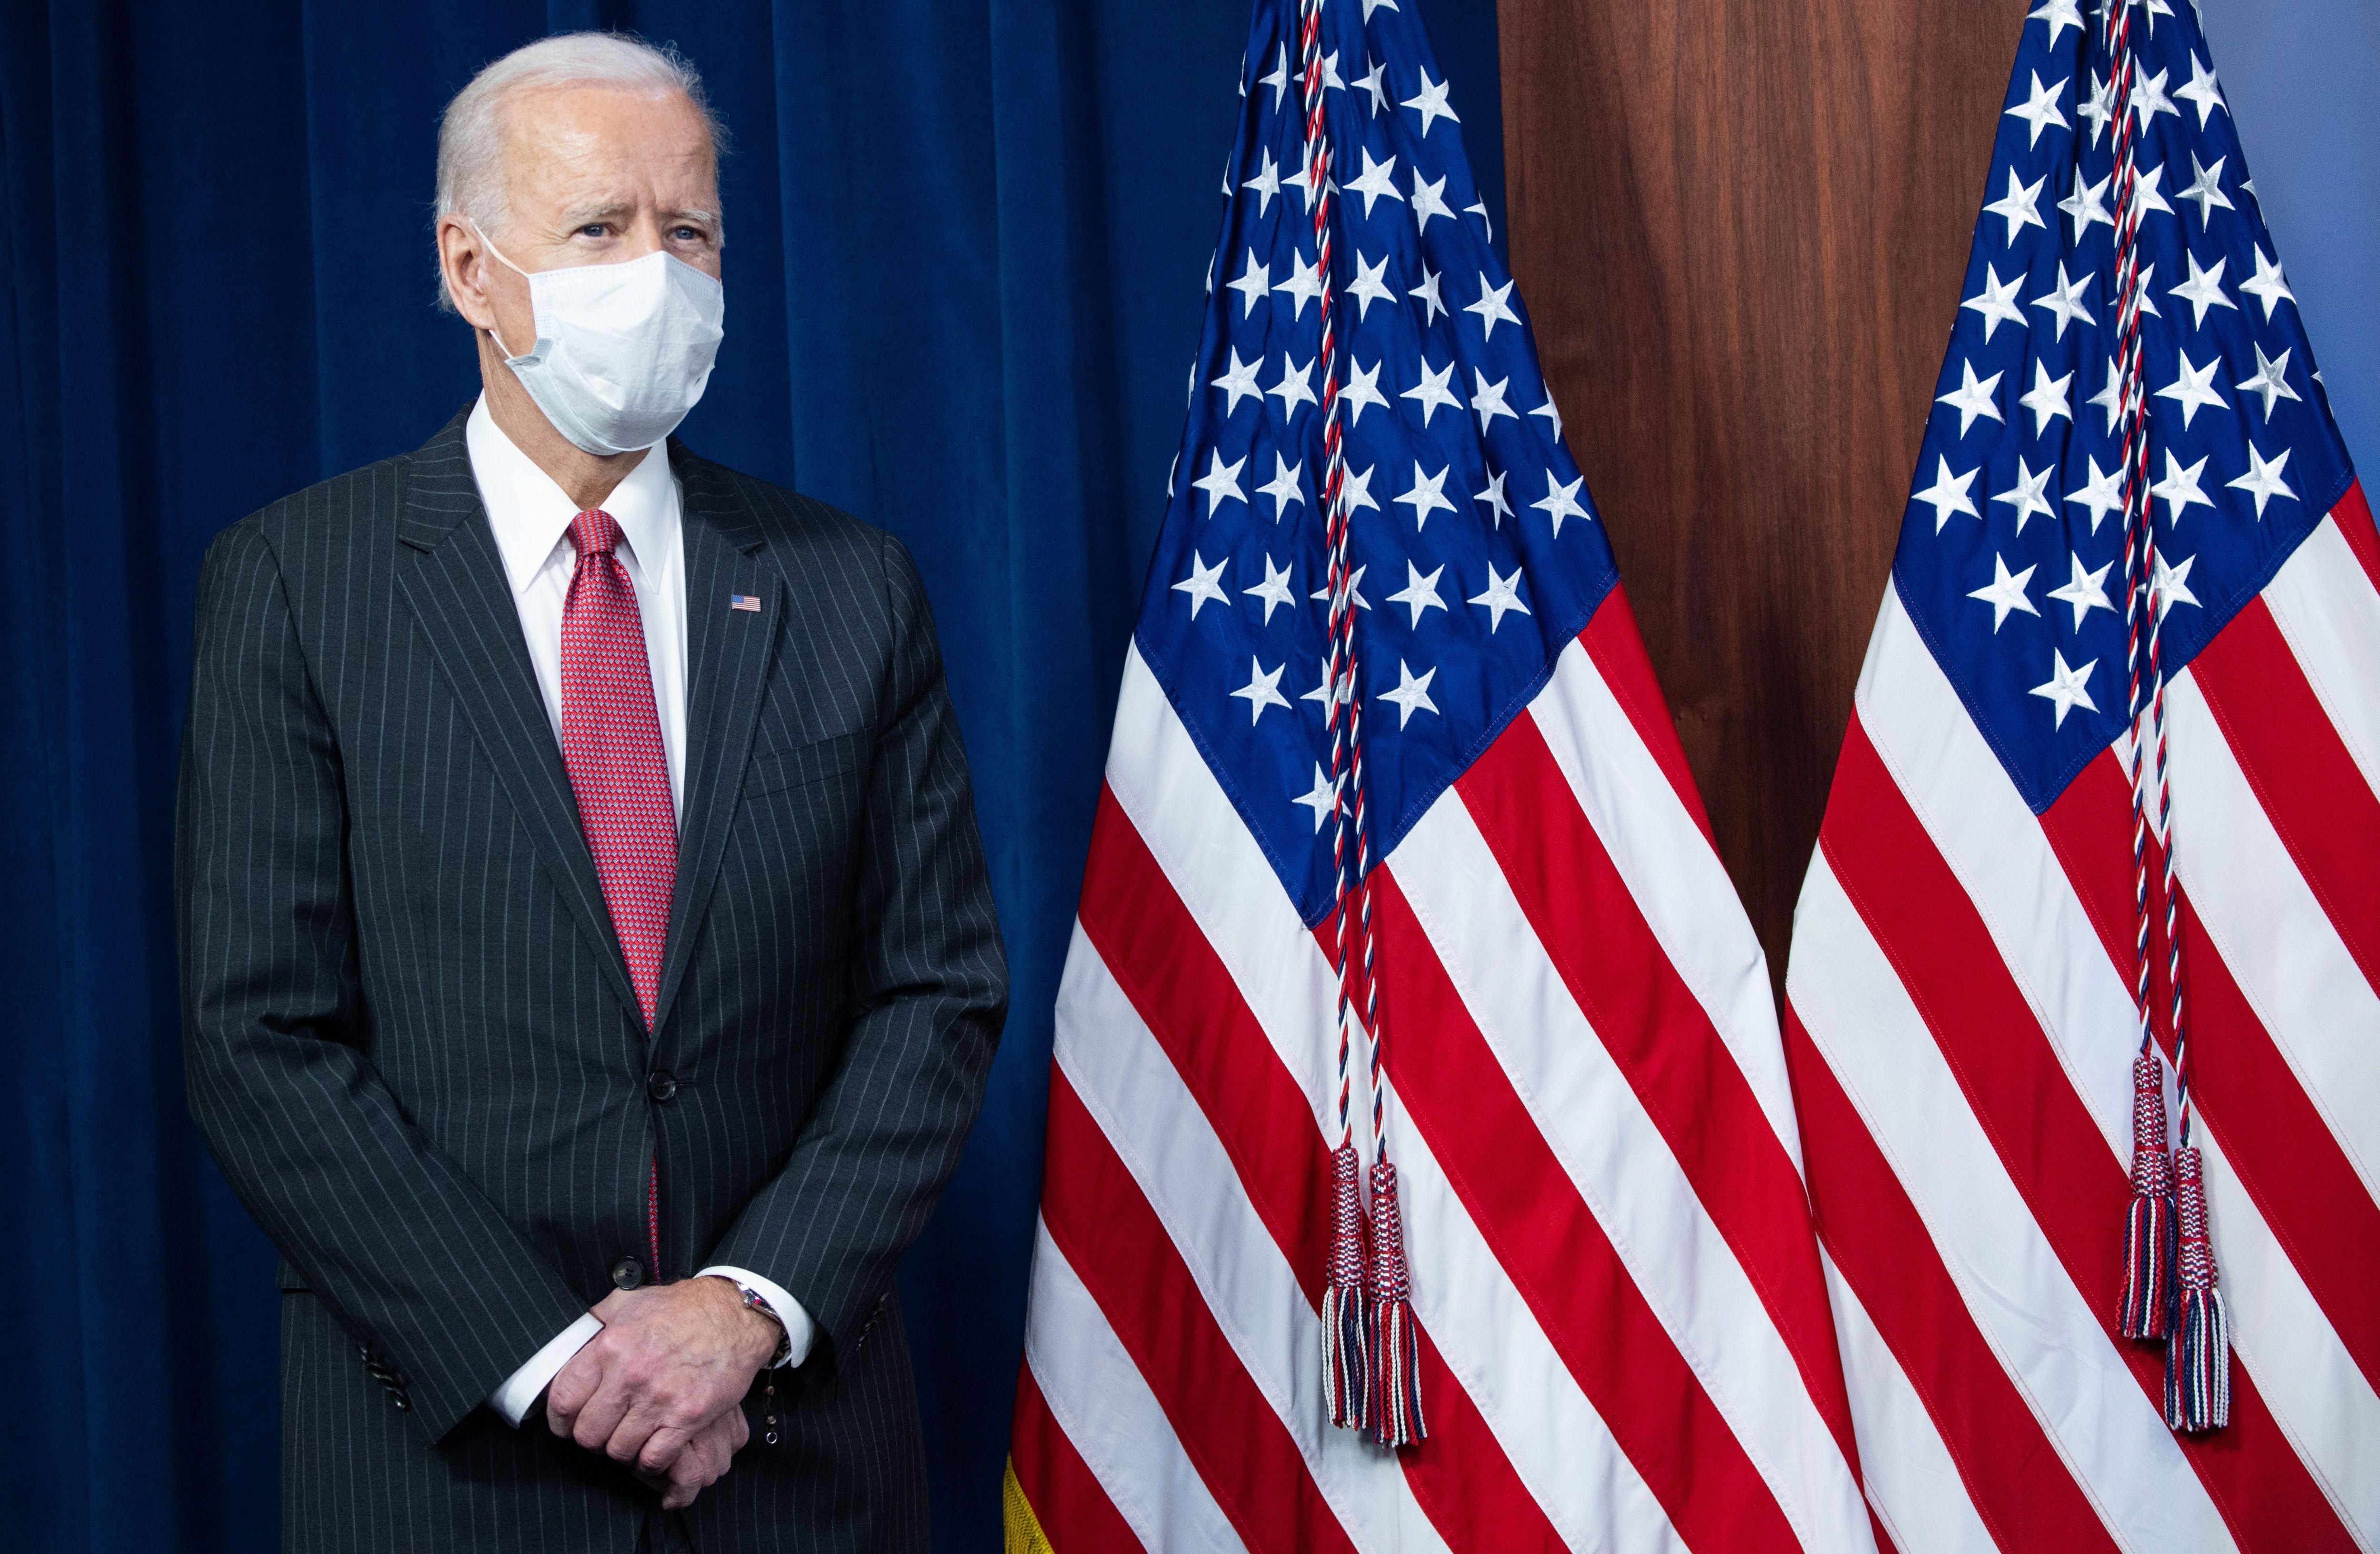 US President Joe Biden waits to speak during a visit to the Pentagon in Washington, DC, on February 10.